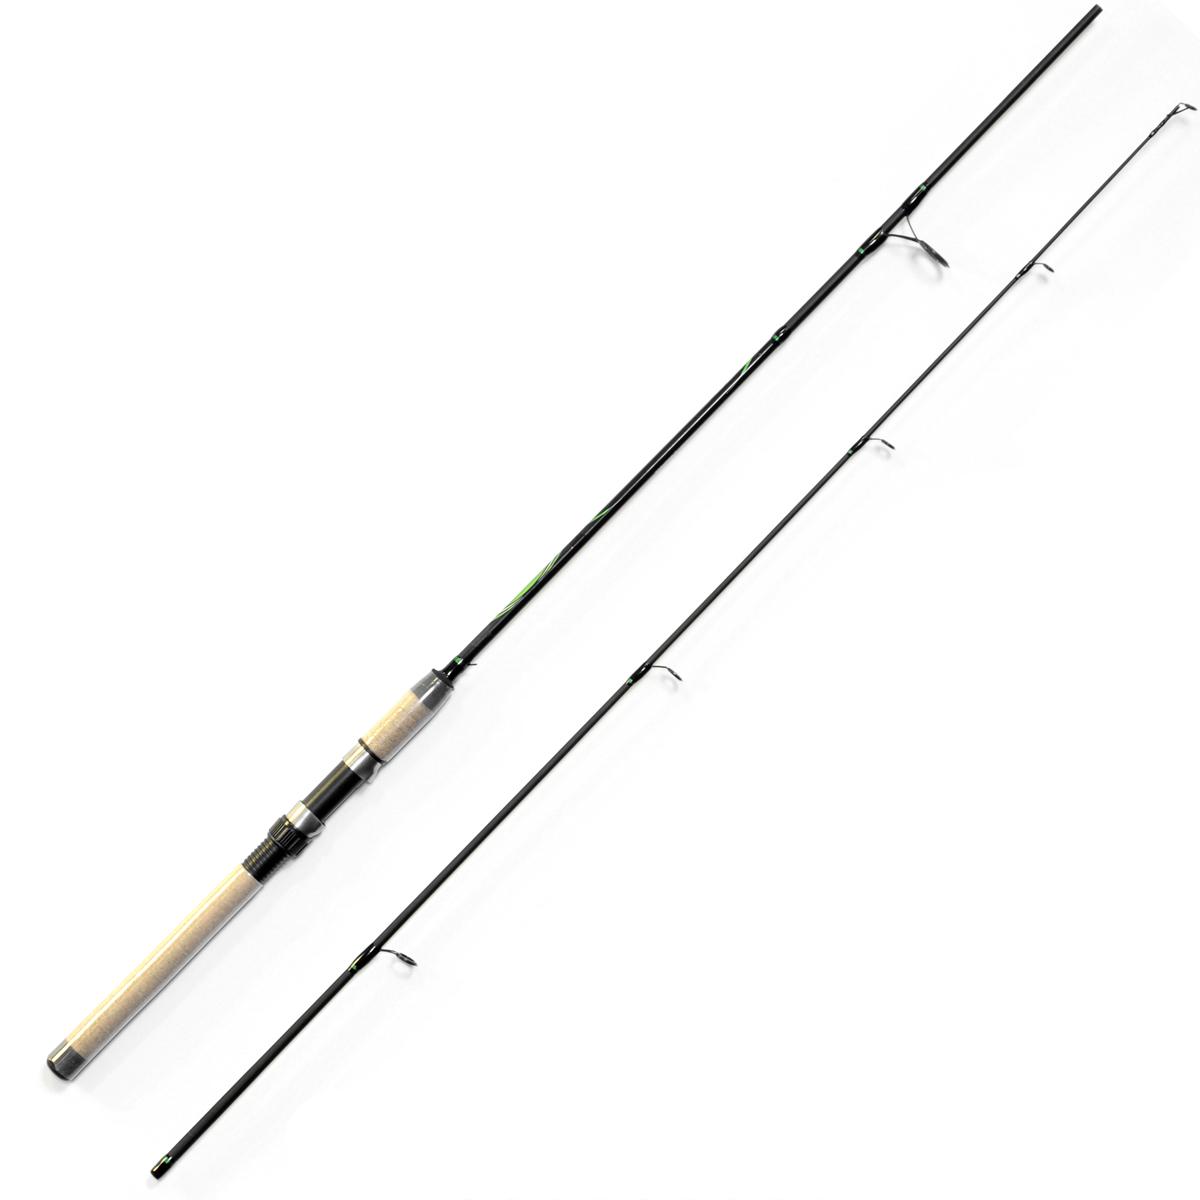 Спиннинг Salmo Sniper Ultra, 2,4 м, 5-25 г спиннинг штекерный swd wisdom 1 8 м 2 10 г